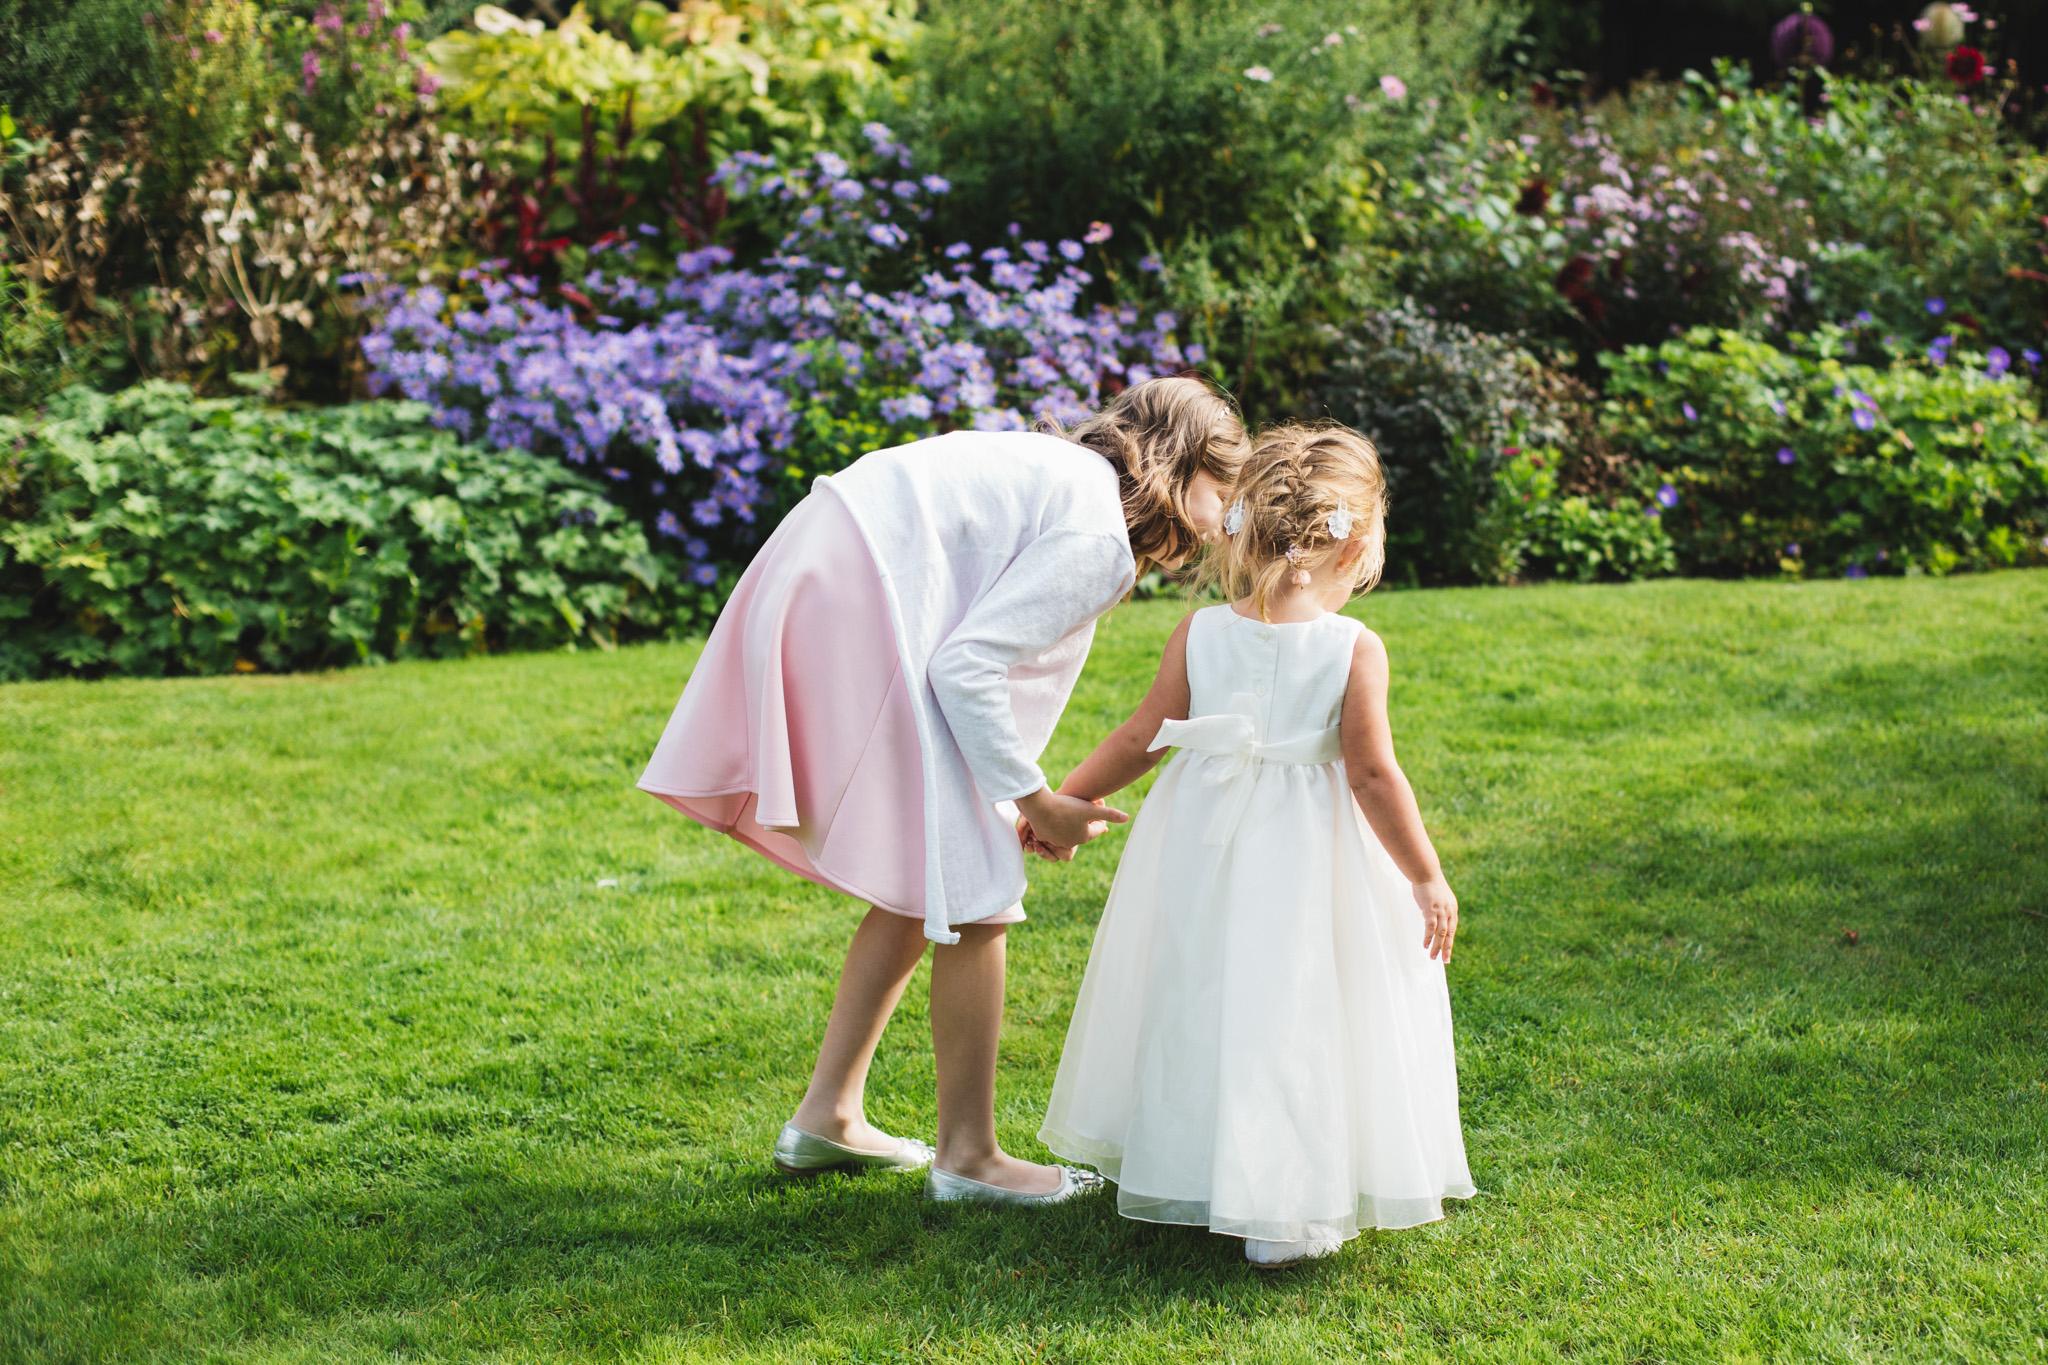 cat-lane-weddings__sheene-mill-wedding-photography__clw__1456_4G2A3166.jpg